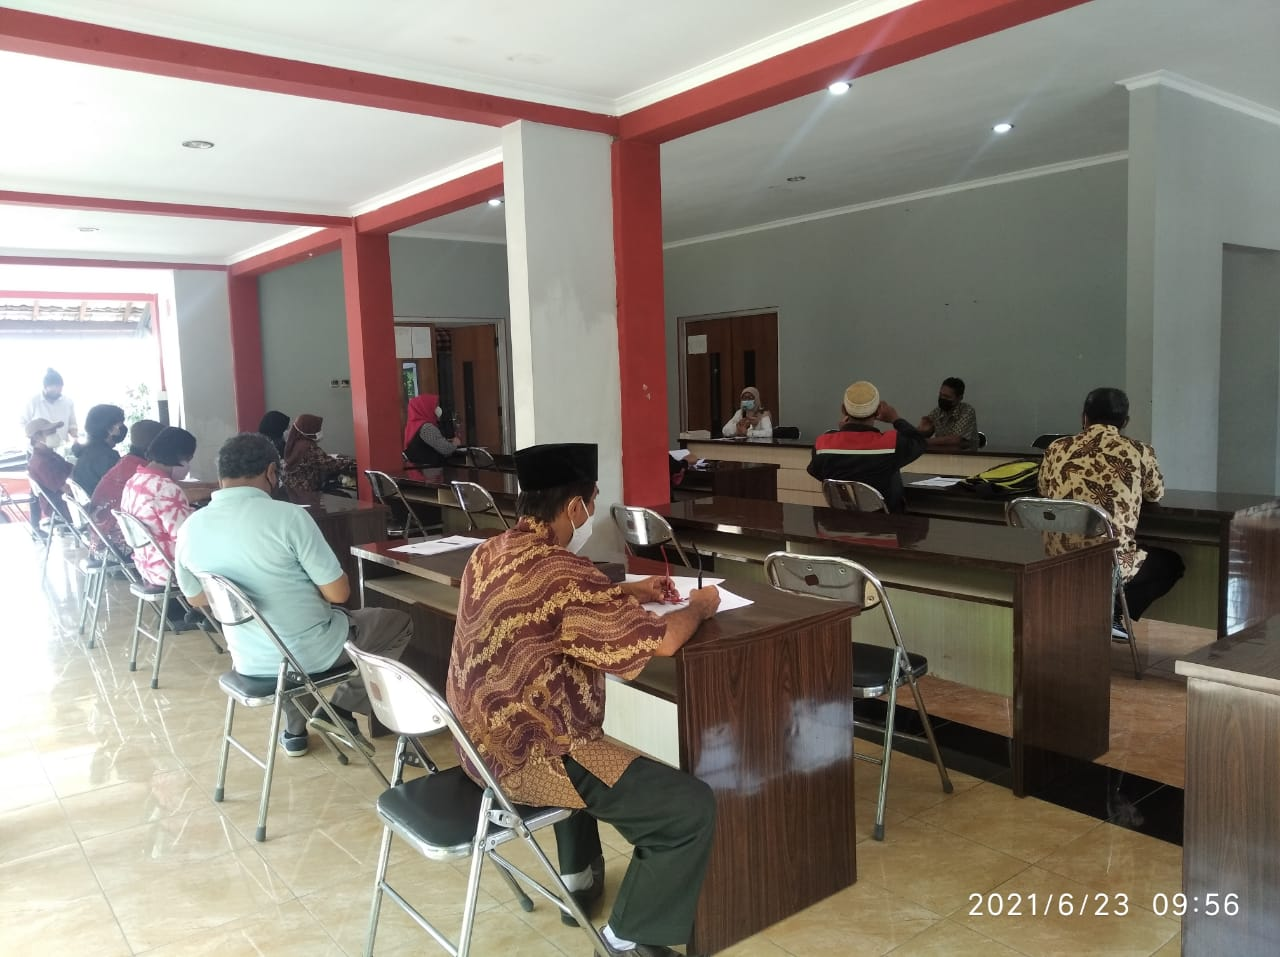 Peningkatan Kapasitas Masyarakat Kota Yogyakarta melalui Bimtek Pengembangan Budidaya Lele